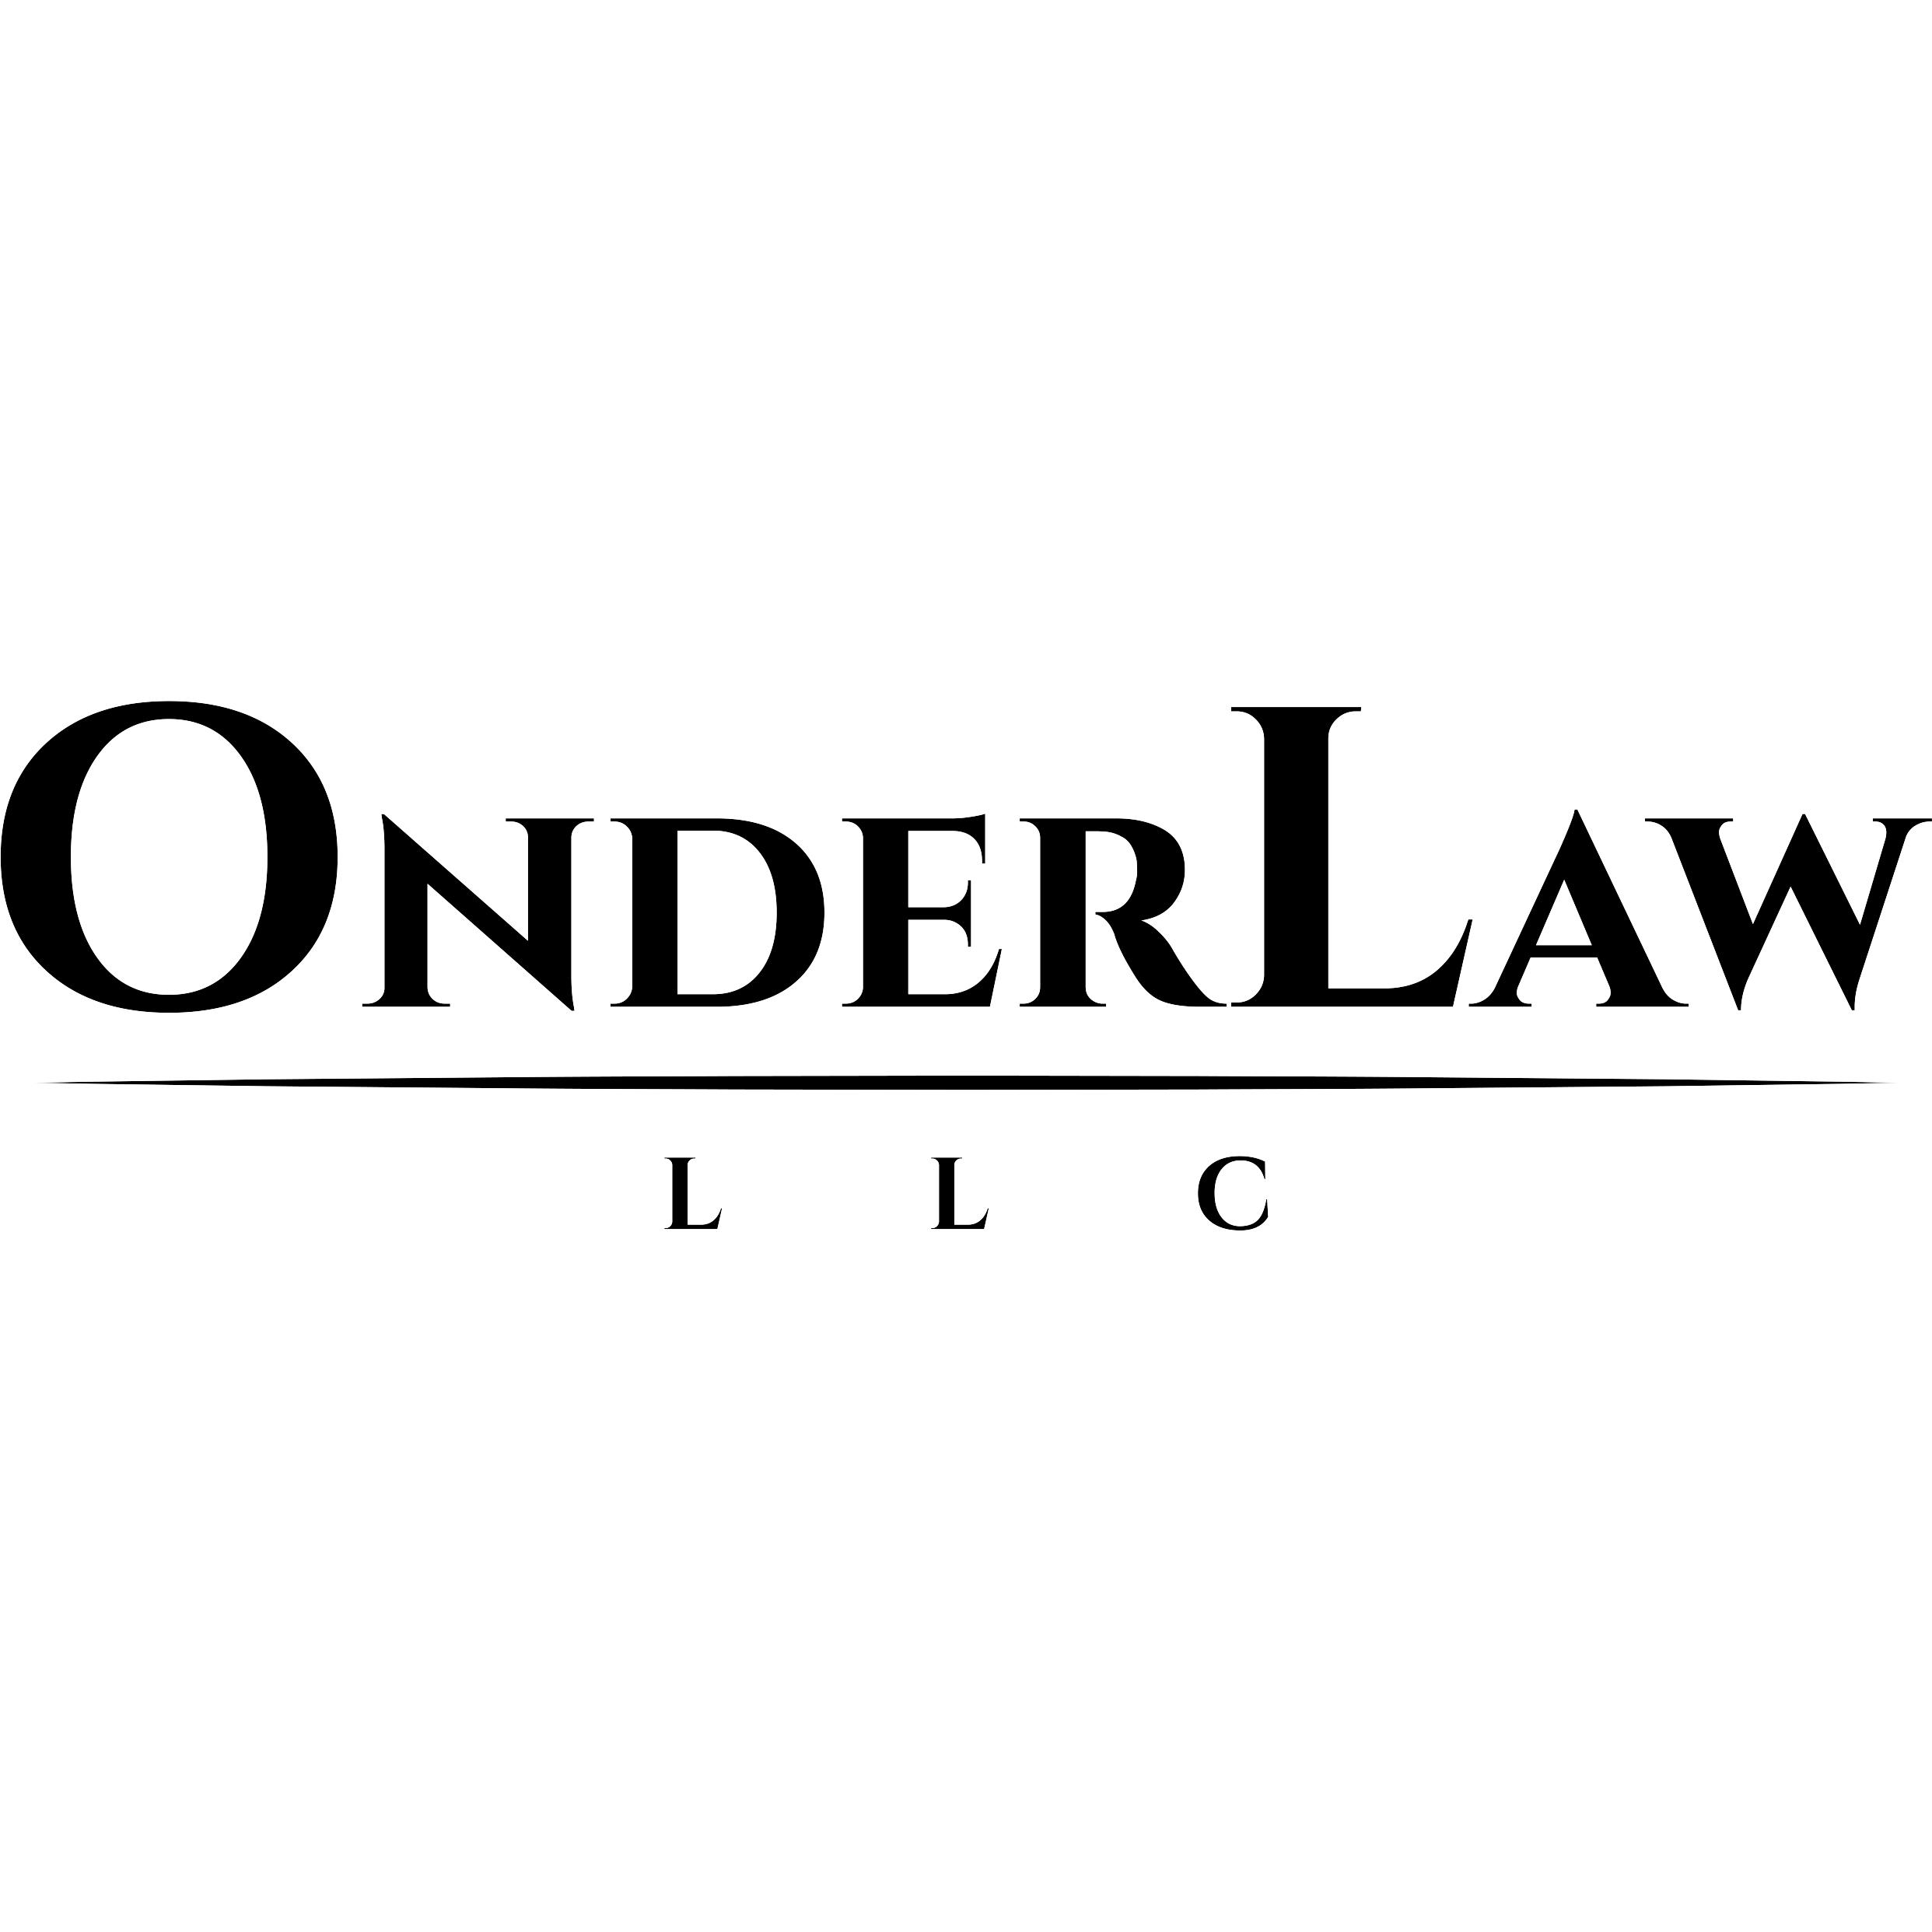 OnderLaw, LLC